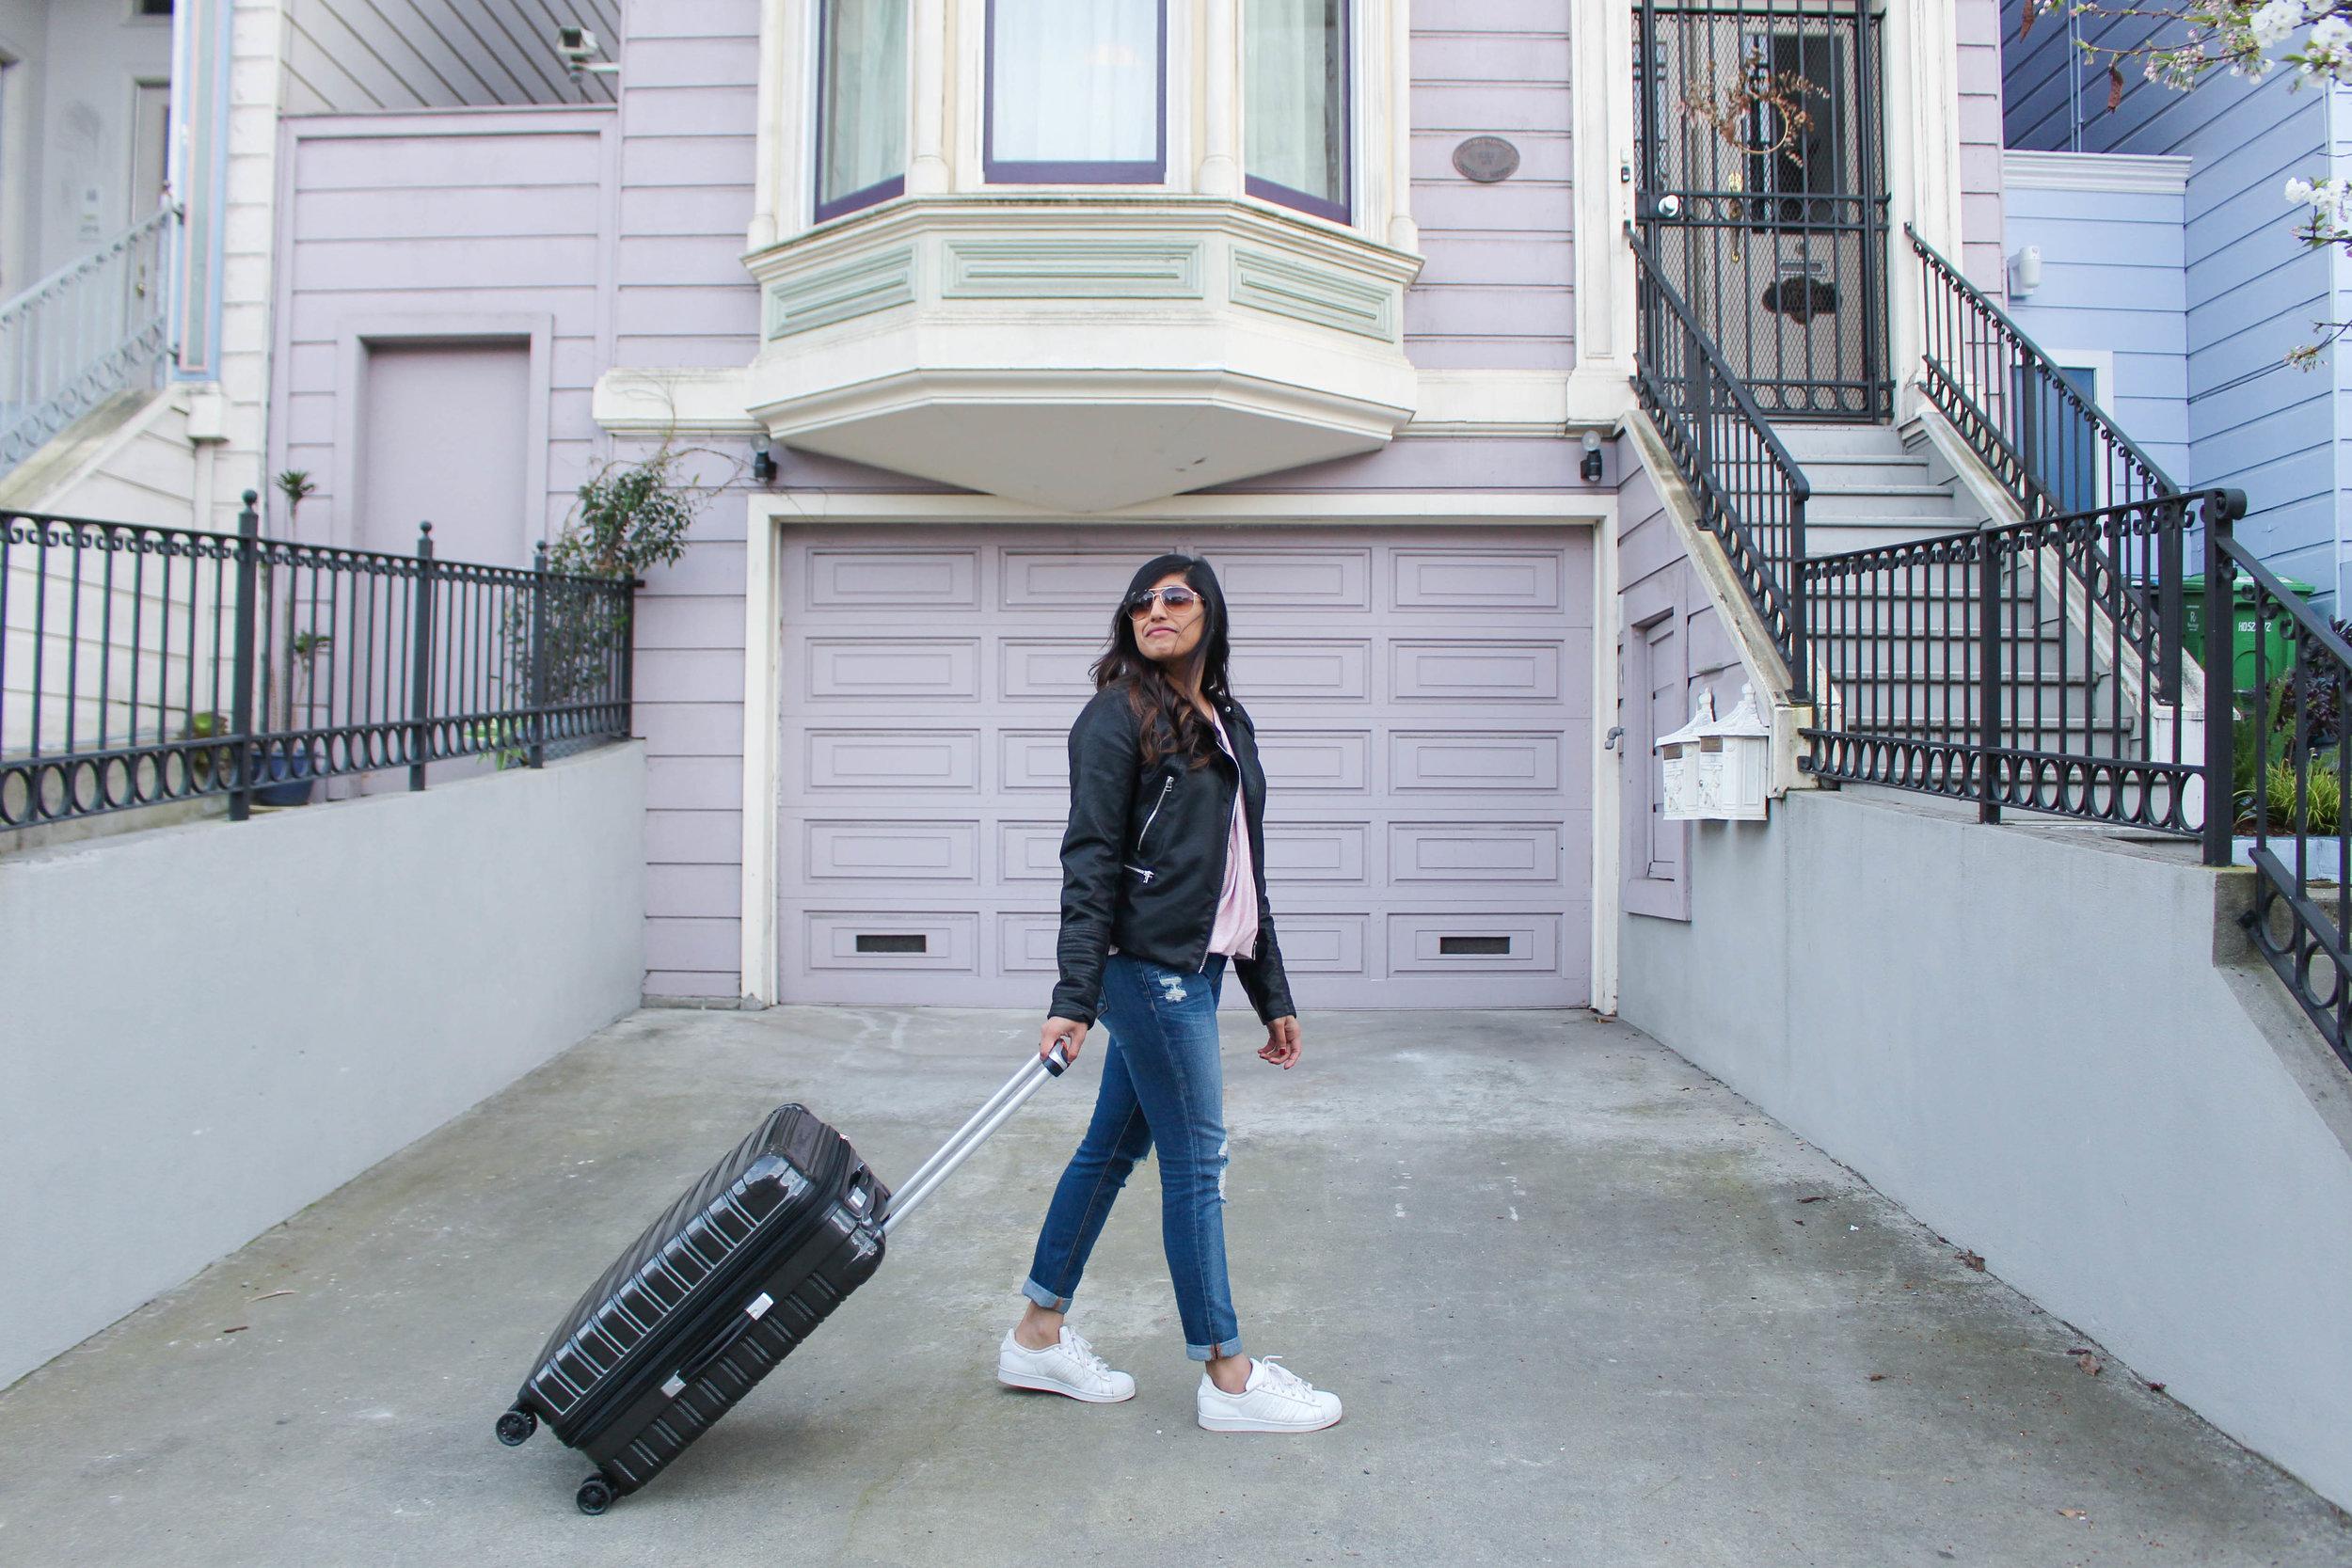 iFLY Luggage - Sugar & Stamps - San Francisco, California